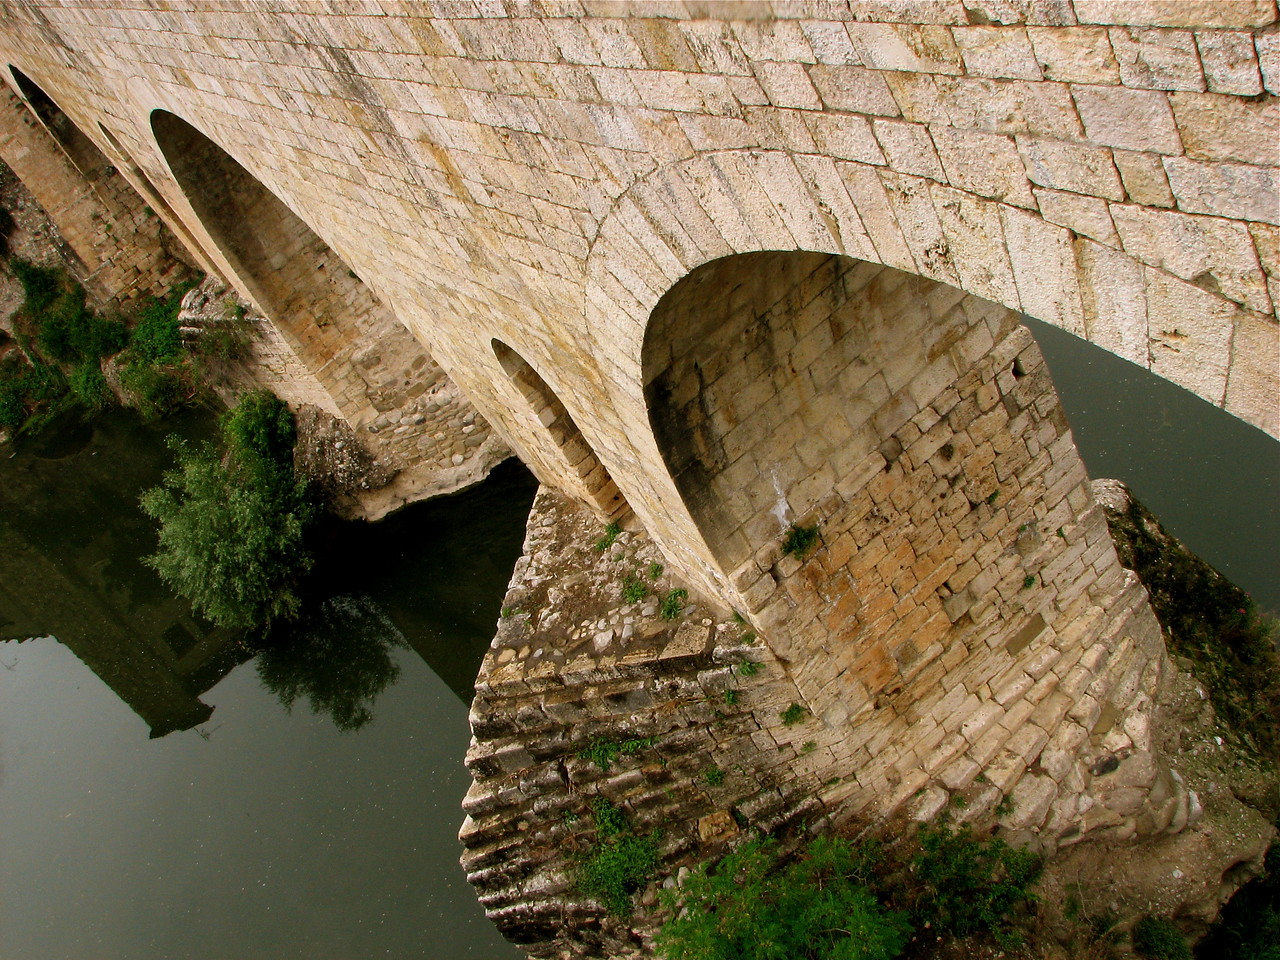 12th century gated medieval bridge over the Rio Fluvia, Besalu, Catalonia, Spain.